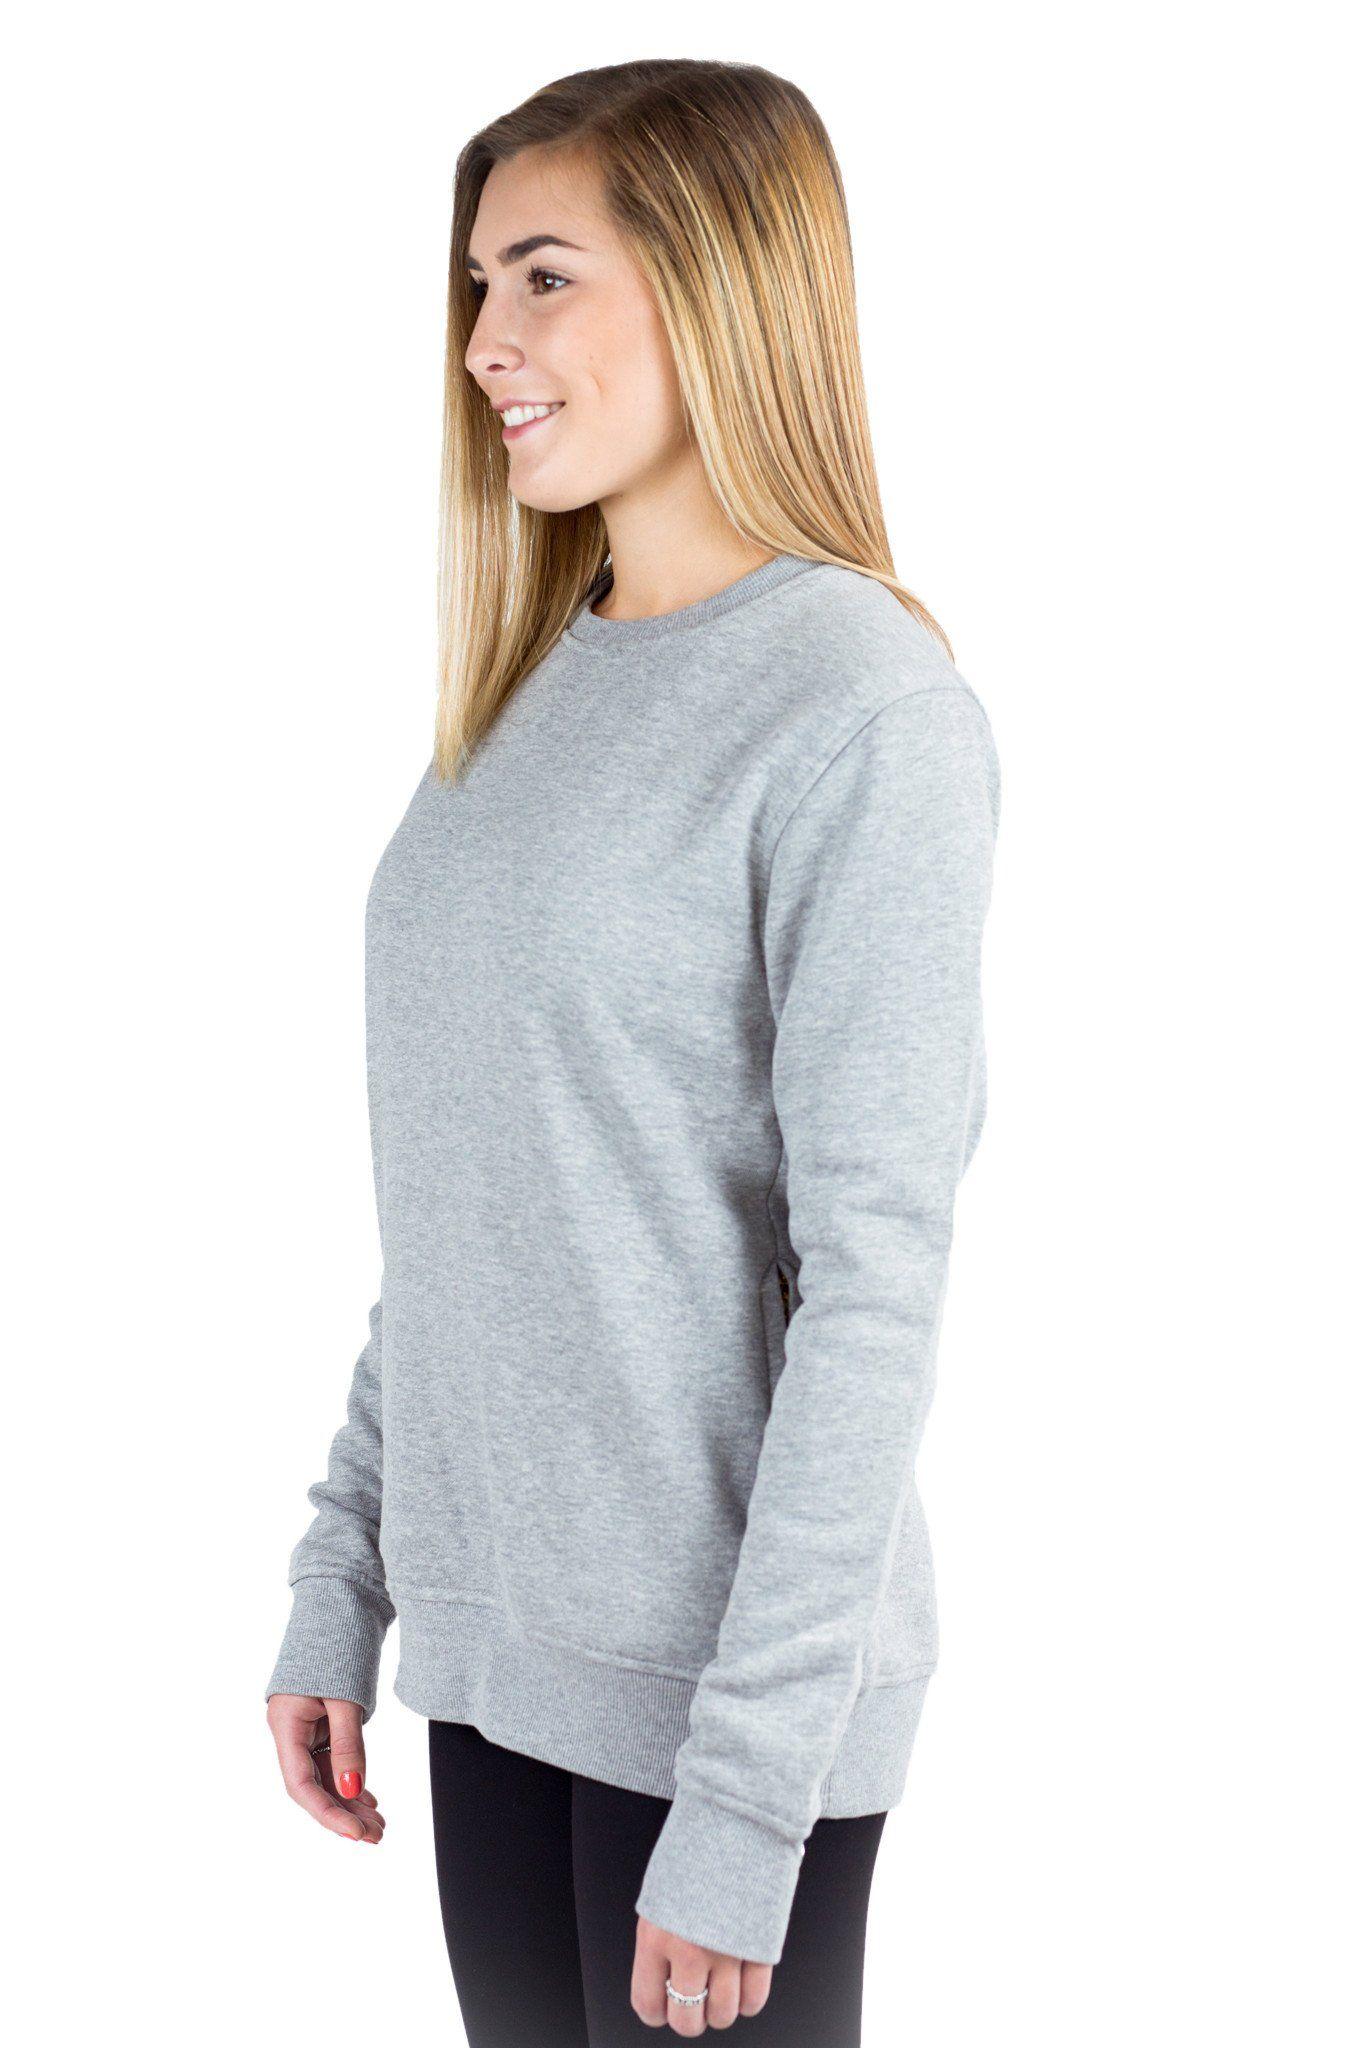 60c49dd51a0 Women Grey Plain Fleece Crewneck Sweatshirt Long sleeve with zip side  pockets from Just Like Hero